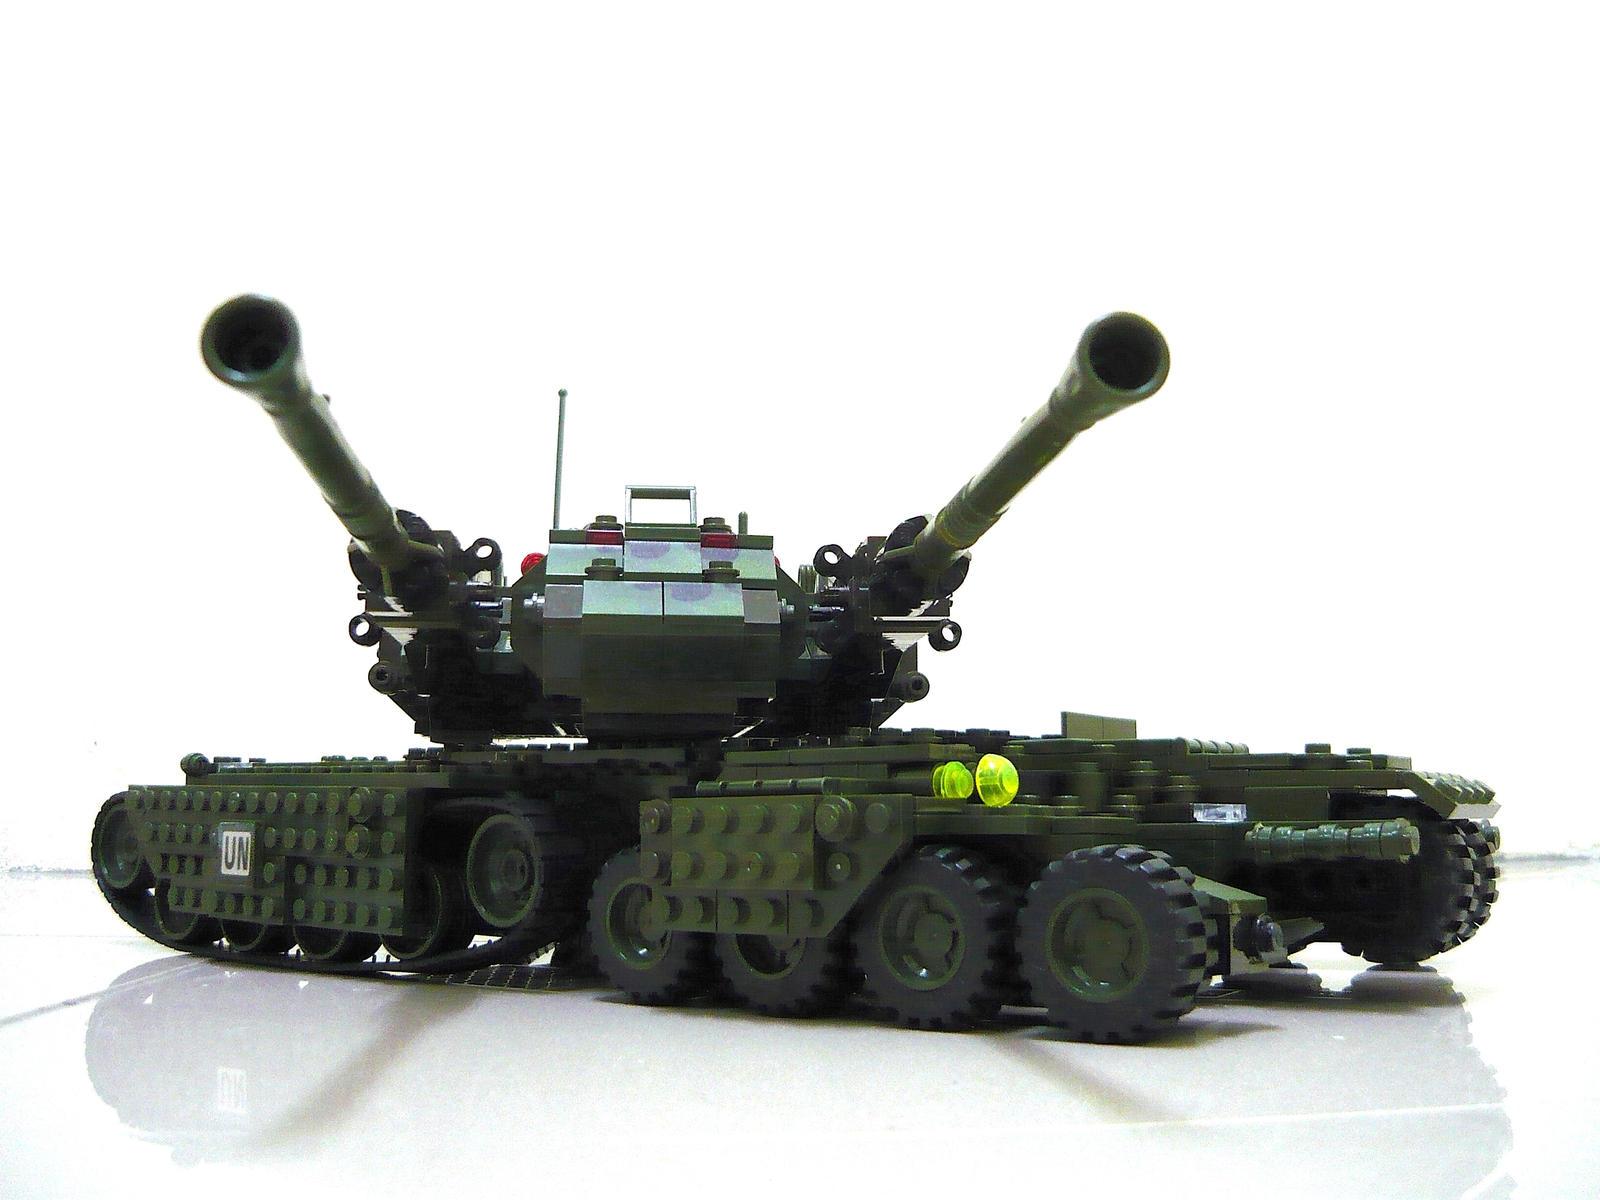 Lego Digital Designer Tank Instructions